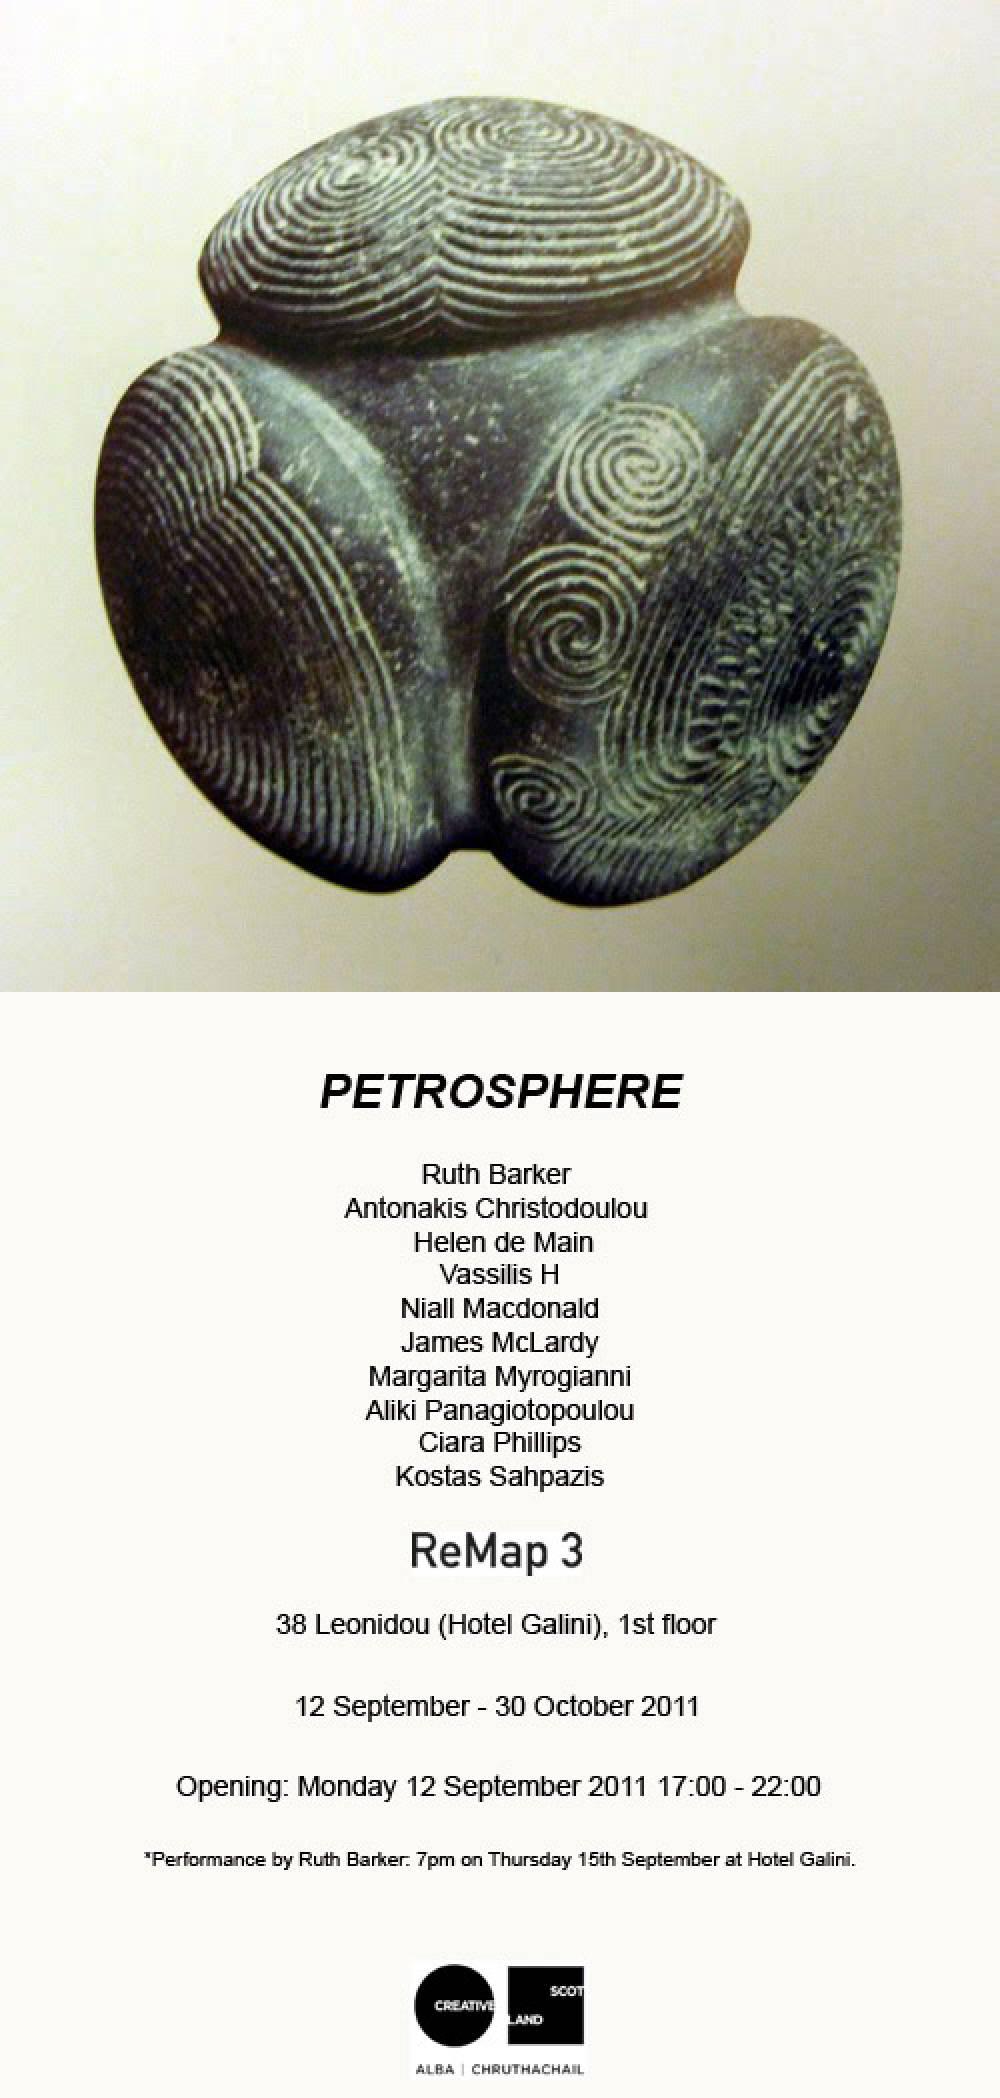 Petrosphere / ReMap 3